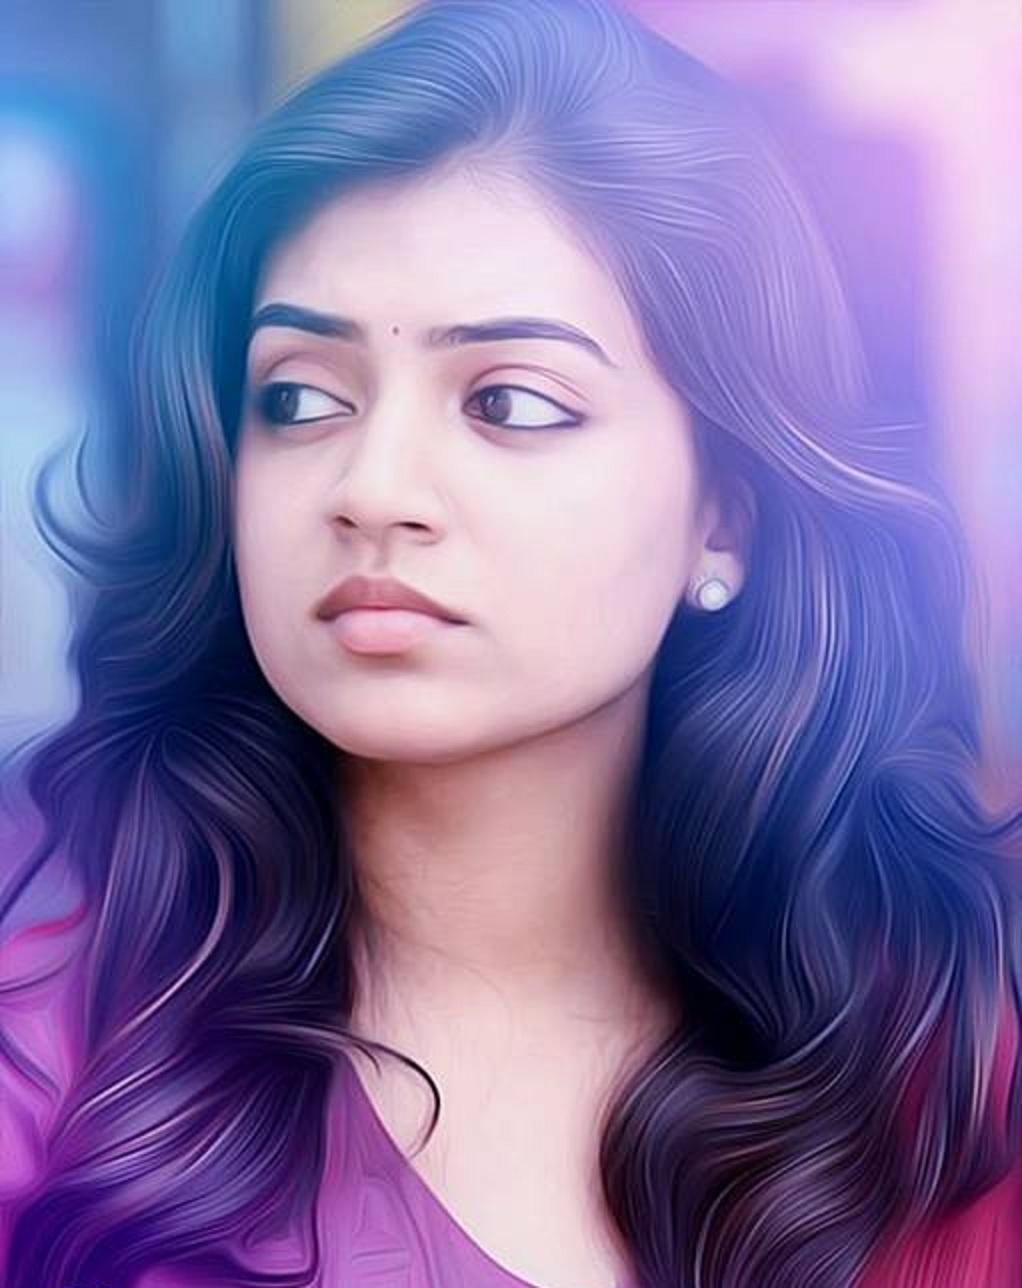 Cute Indian Actress Hd Wallpapers Nazriya Nazim Hd Wallpapers Free Download Download Free